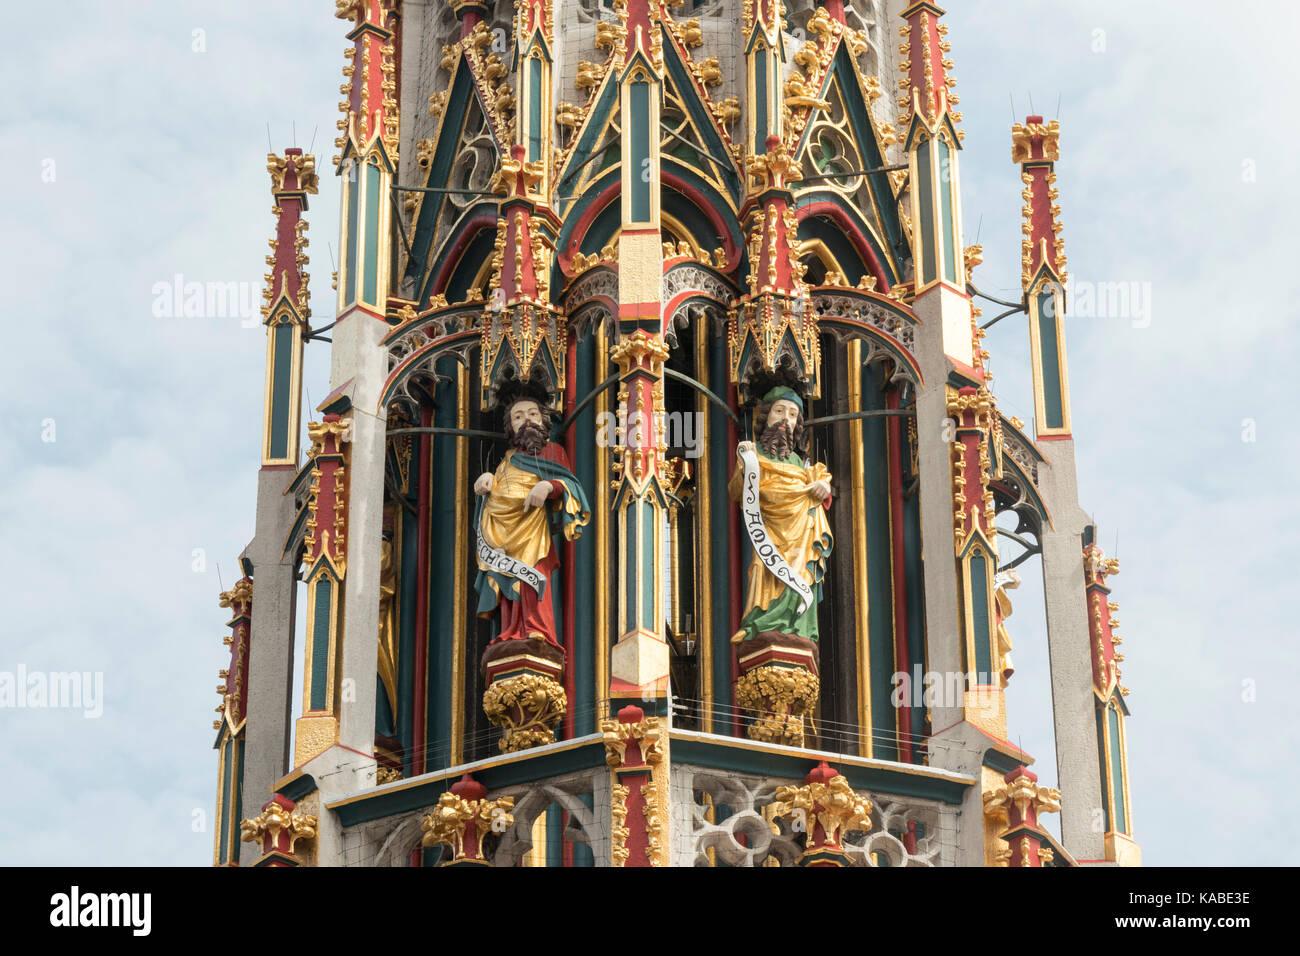 The Schöner Brunnen or beautiful fountain, Nuremberg Stock Photo